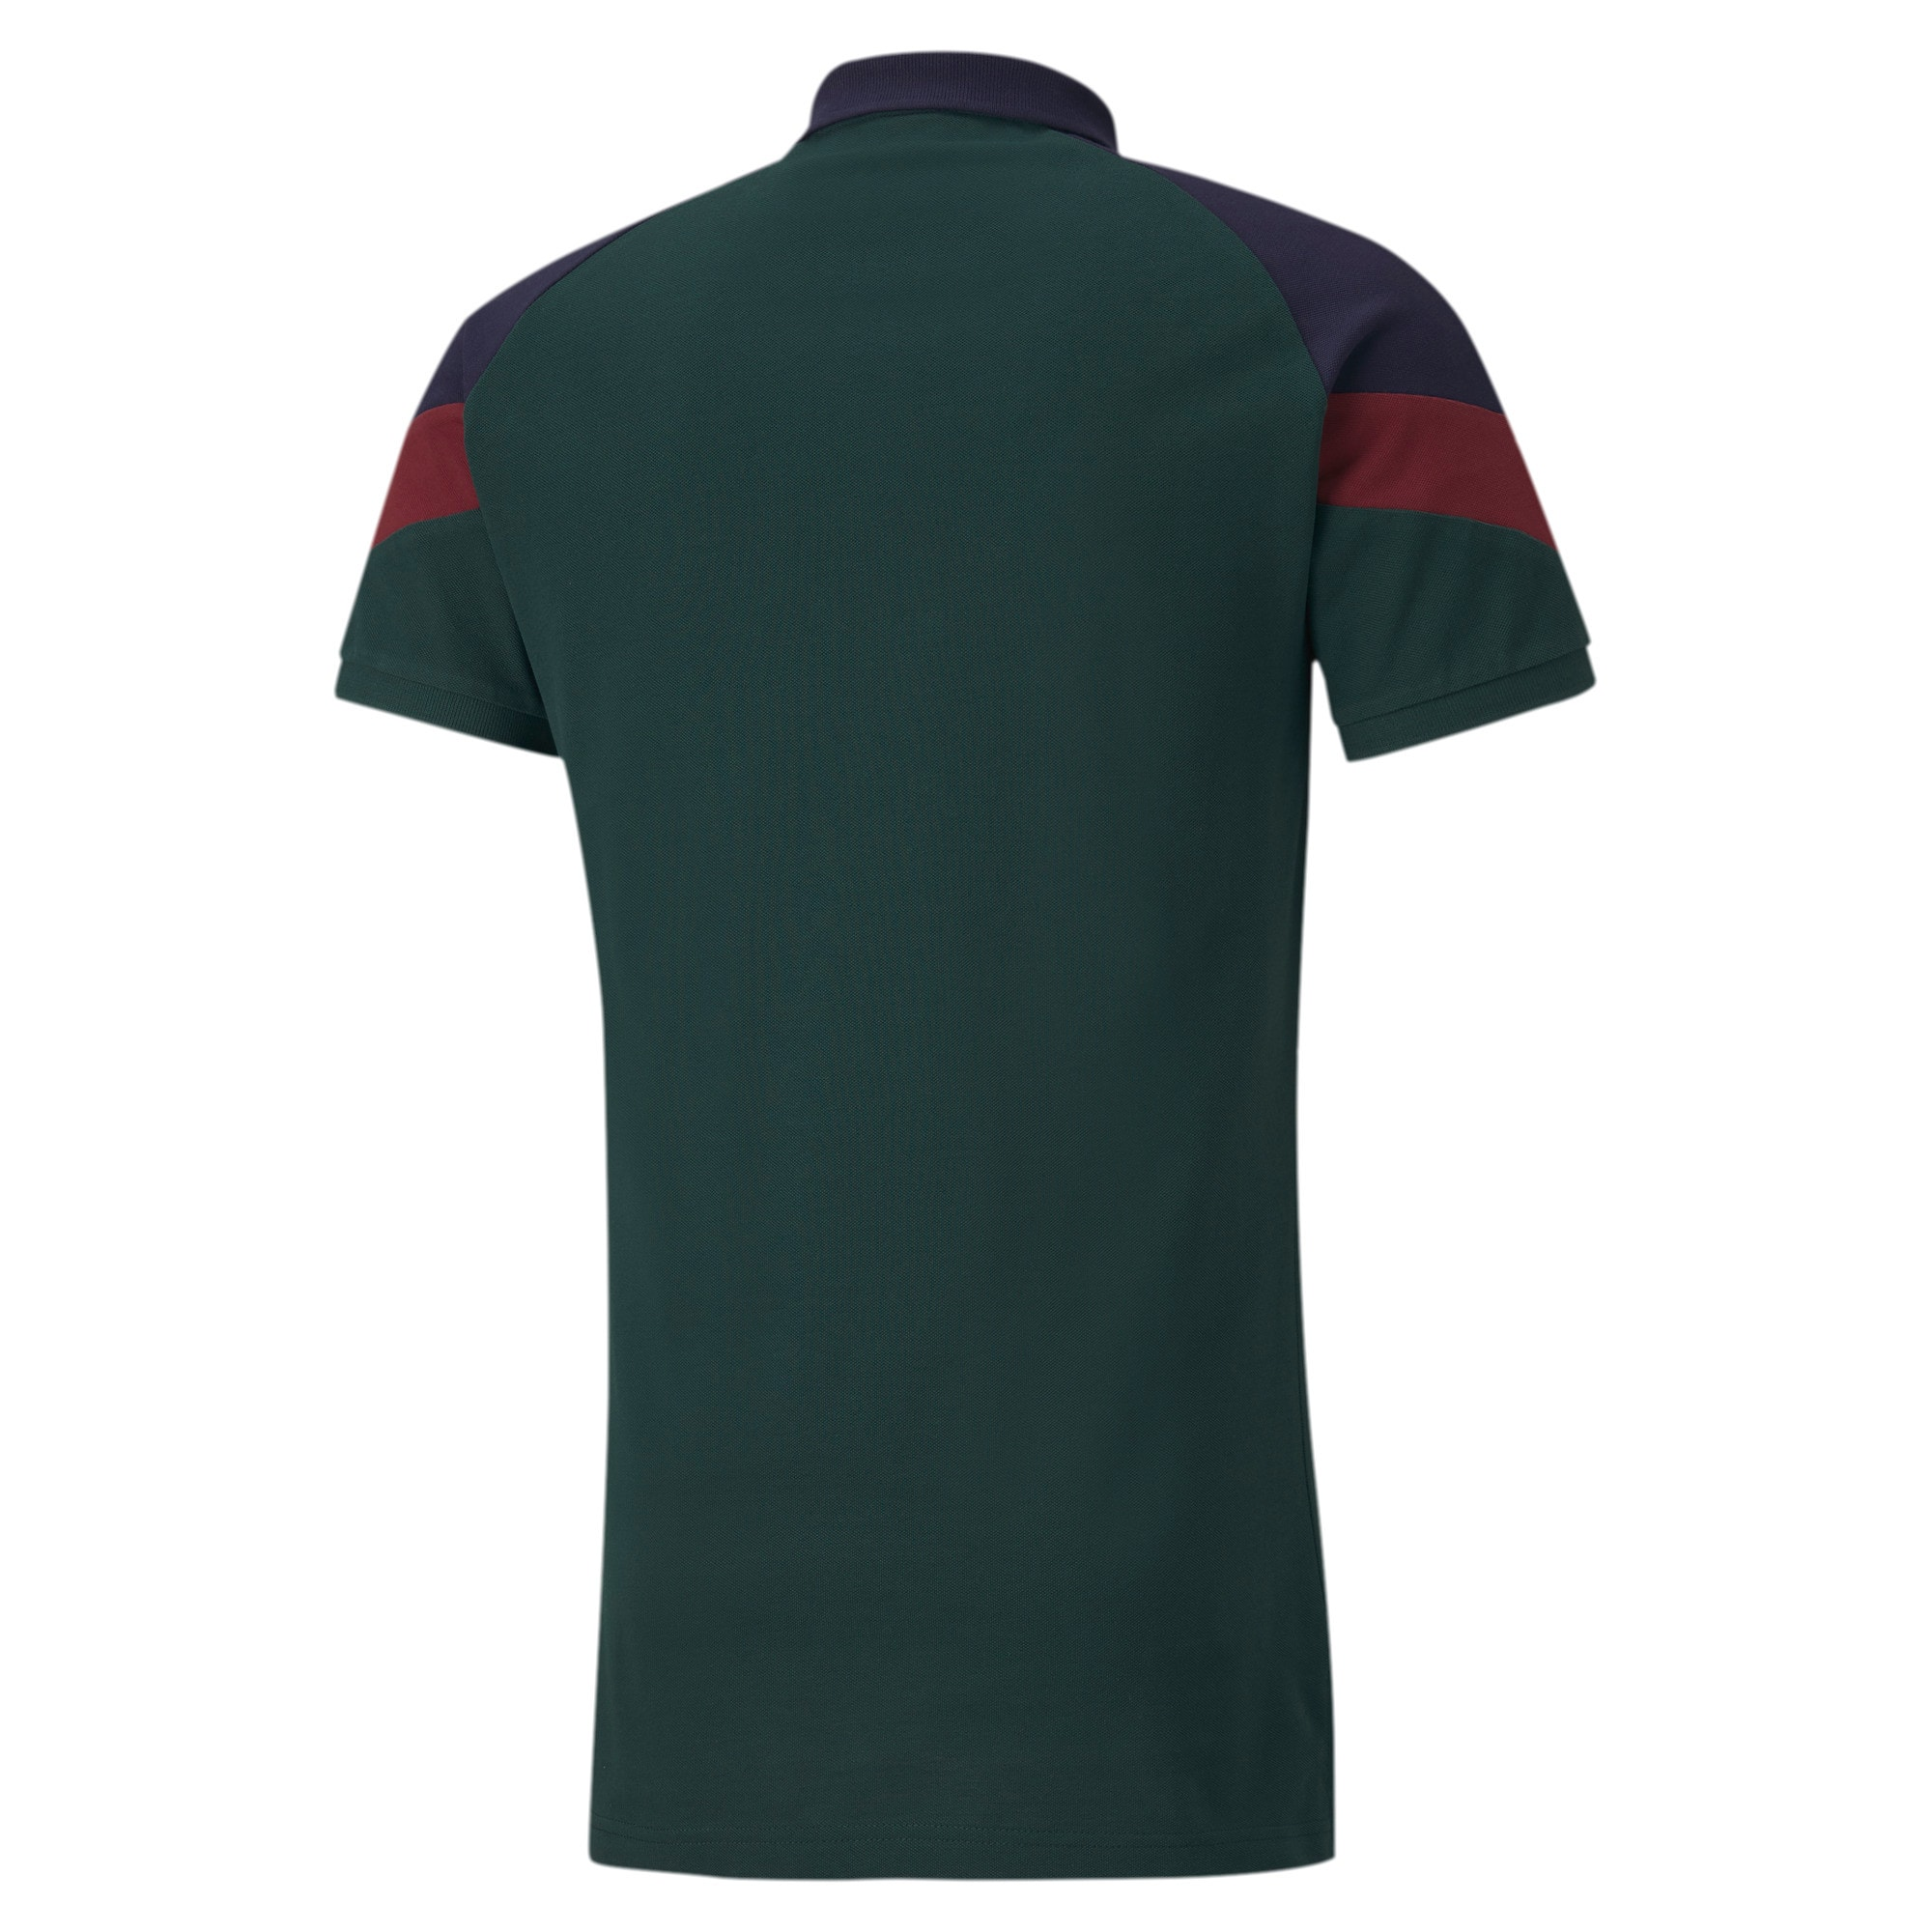 Thumbnail 3 of FIGC イタリア ICONIC MCS ポロシャツ 半袖, Ponderosa Pine-peacoat, medium-JPN